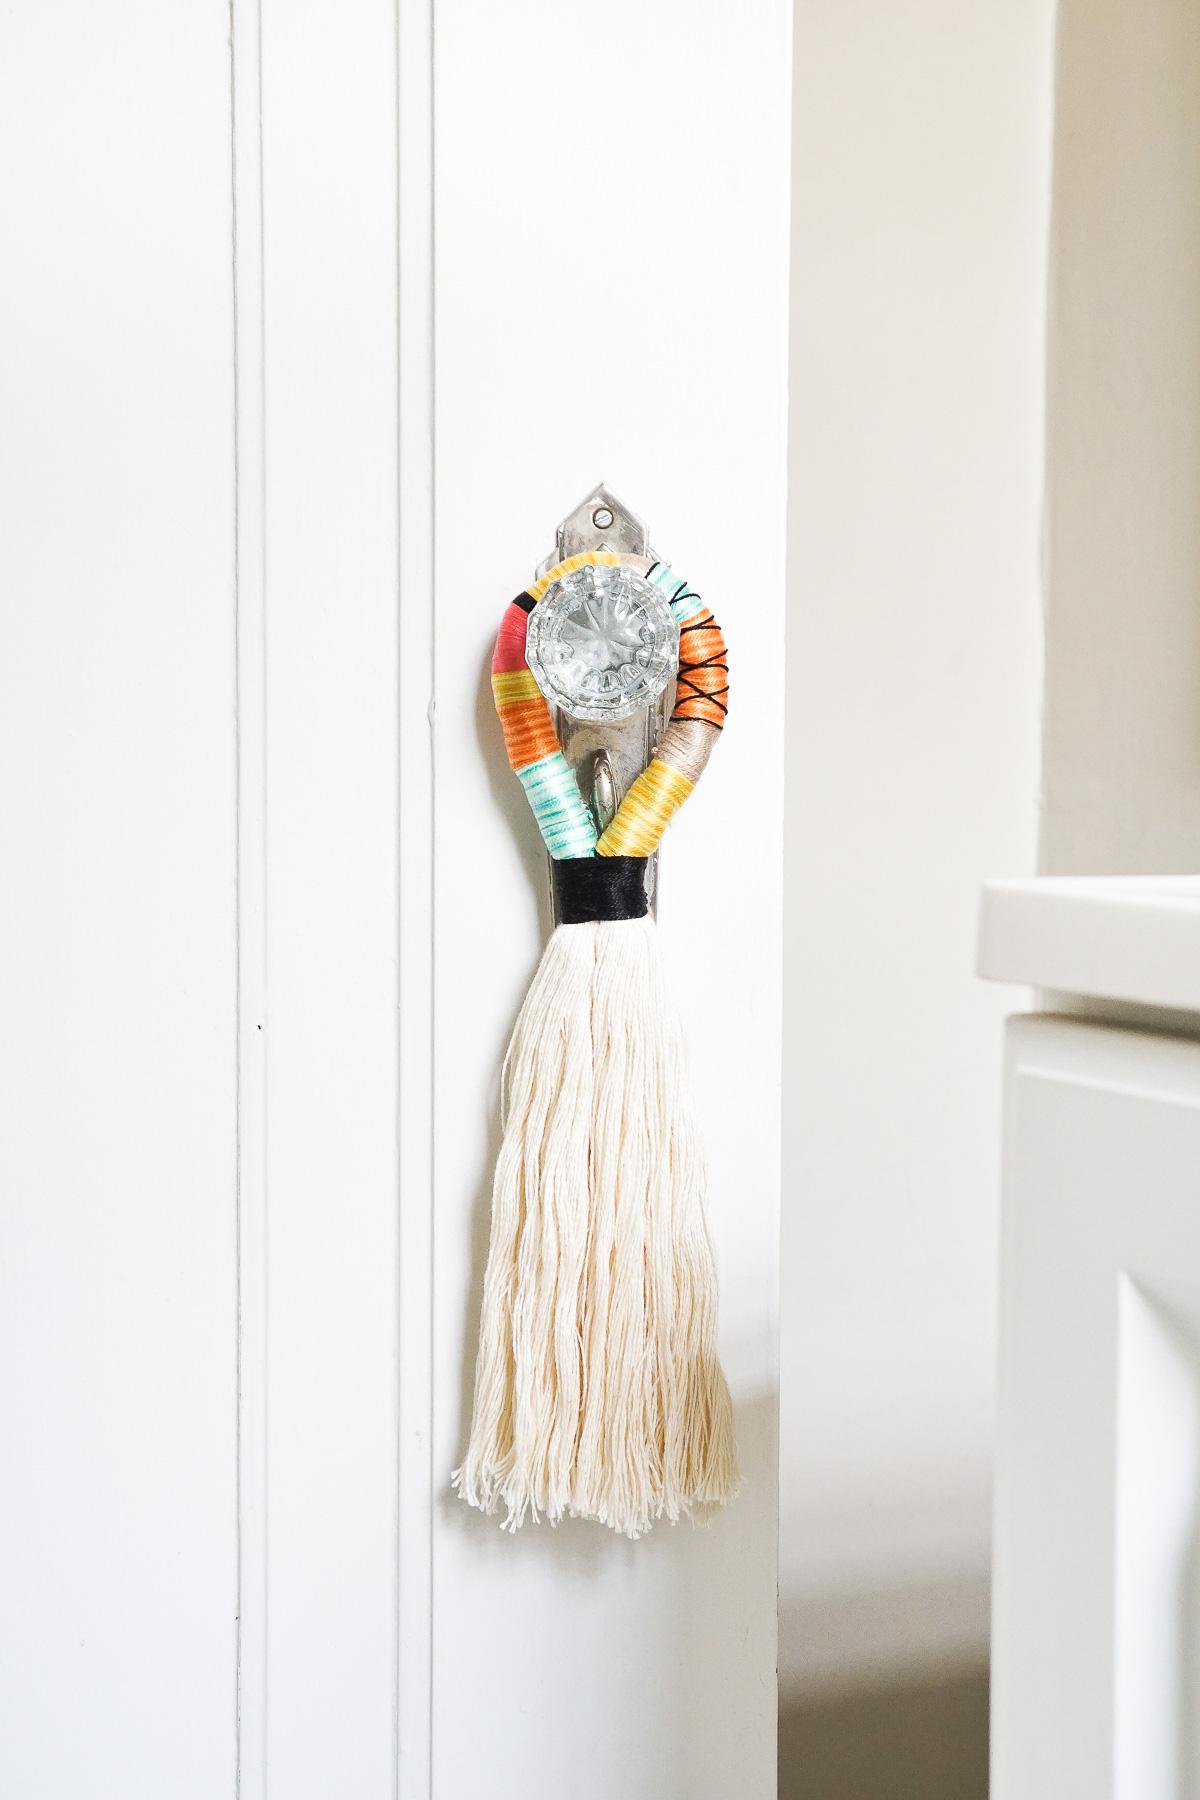 Home Design Trends: Chic Door Knob Tassels. DIY Door Handle Rope Tassels. Click through for the details. | glitterinc.com | @glitterinc